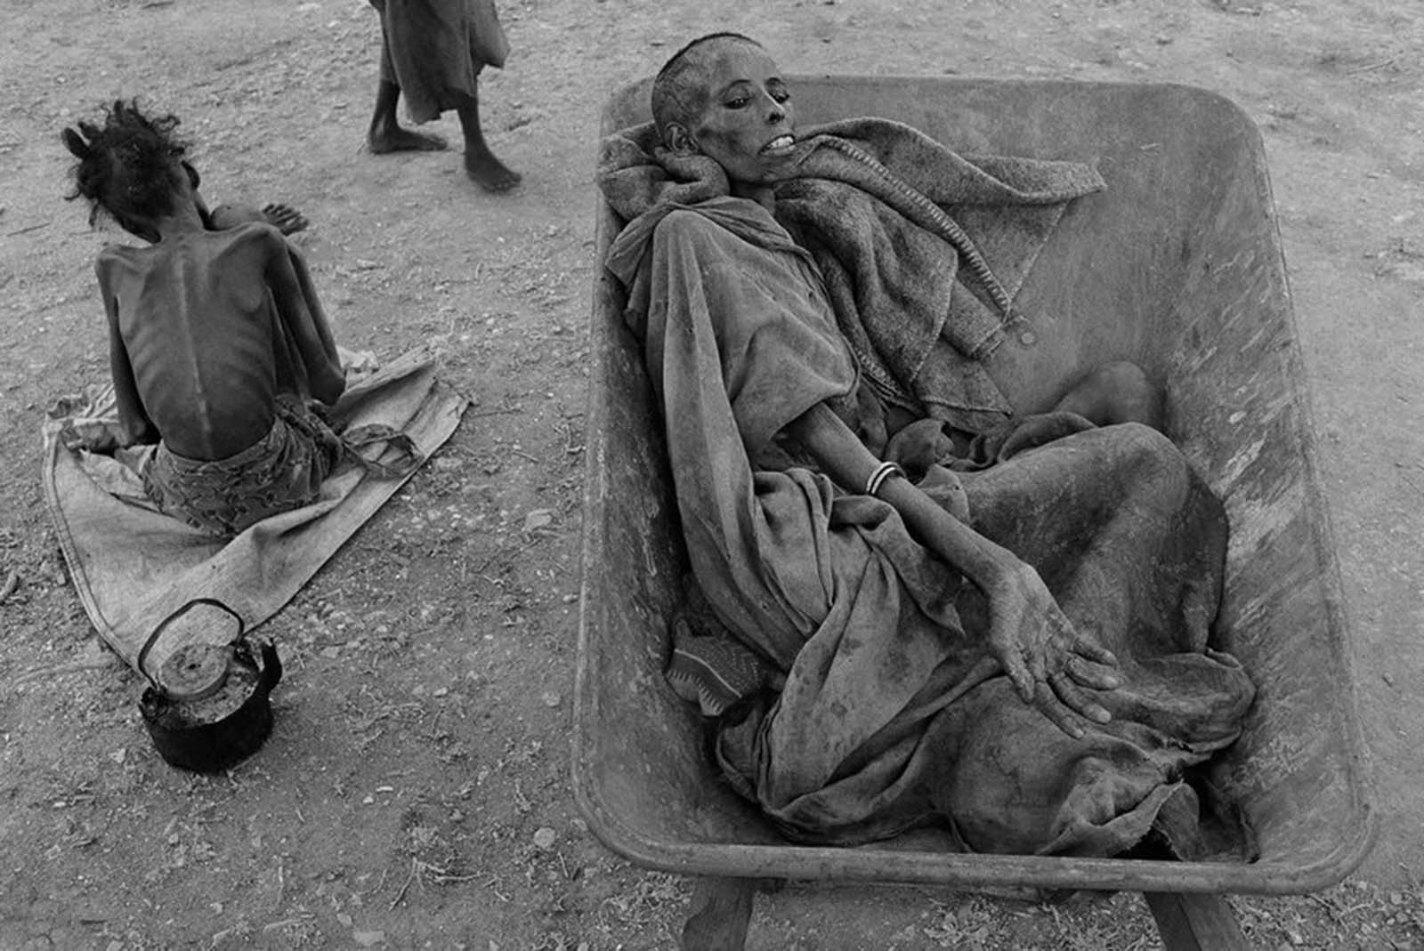 History photo Famine in Somalia, James Nachtwey, 1992